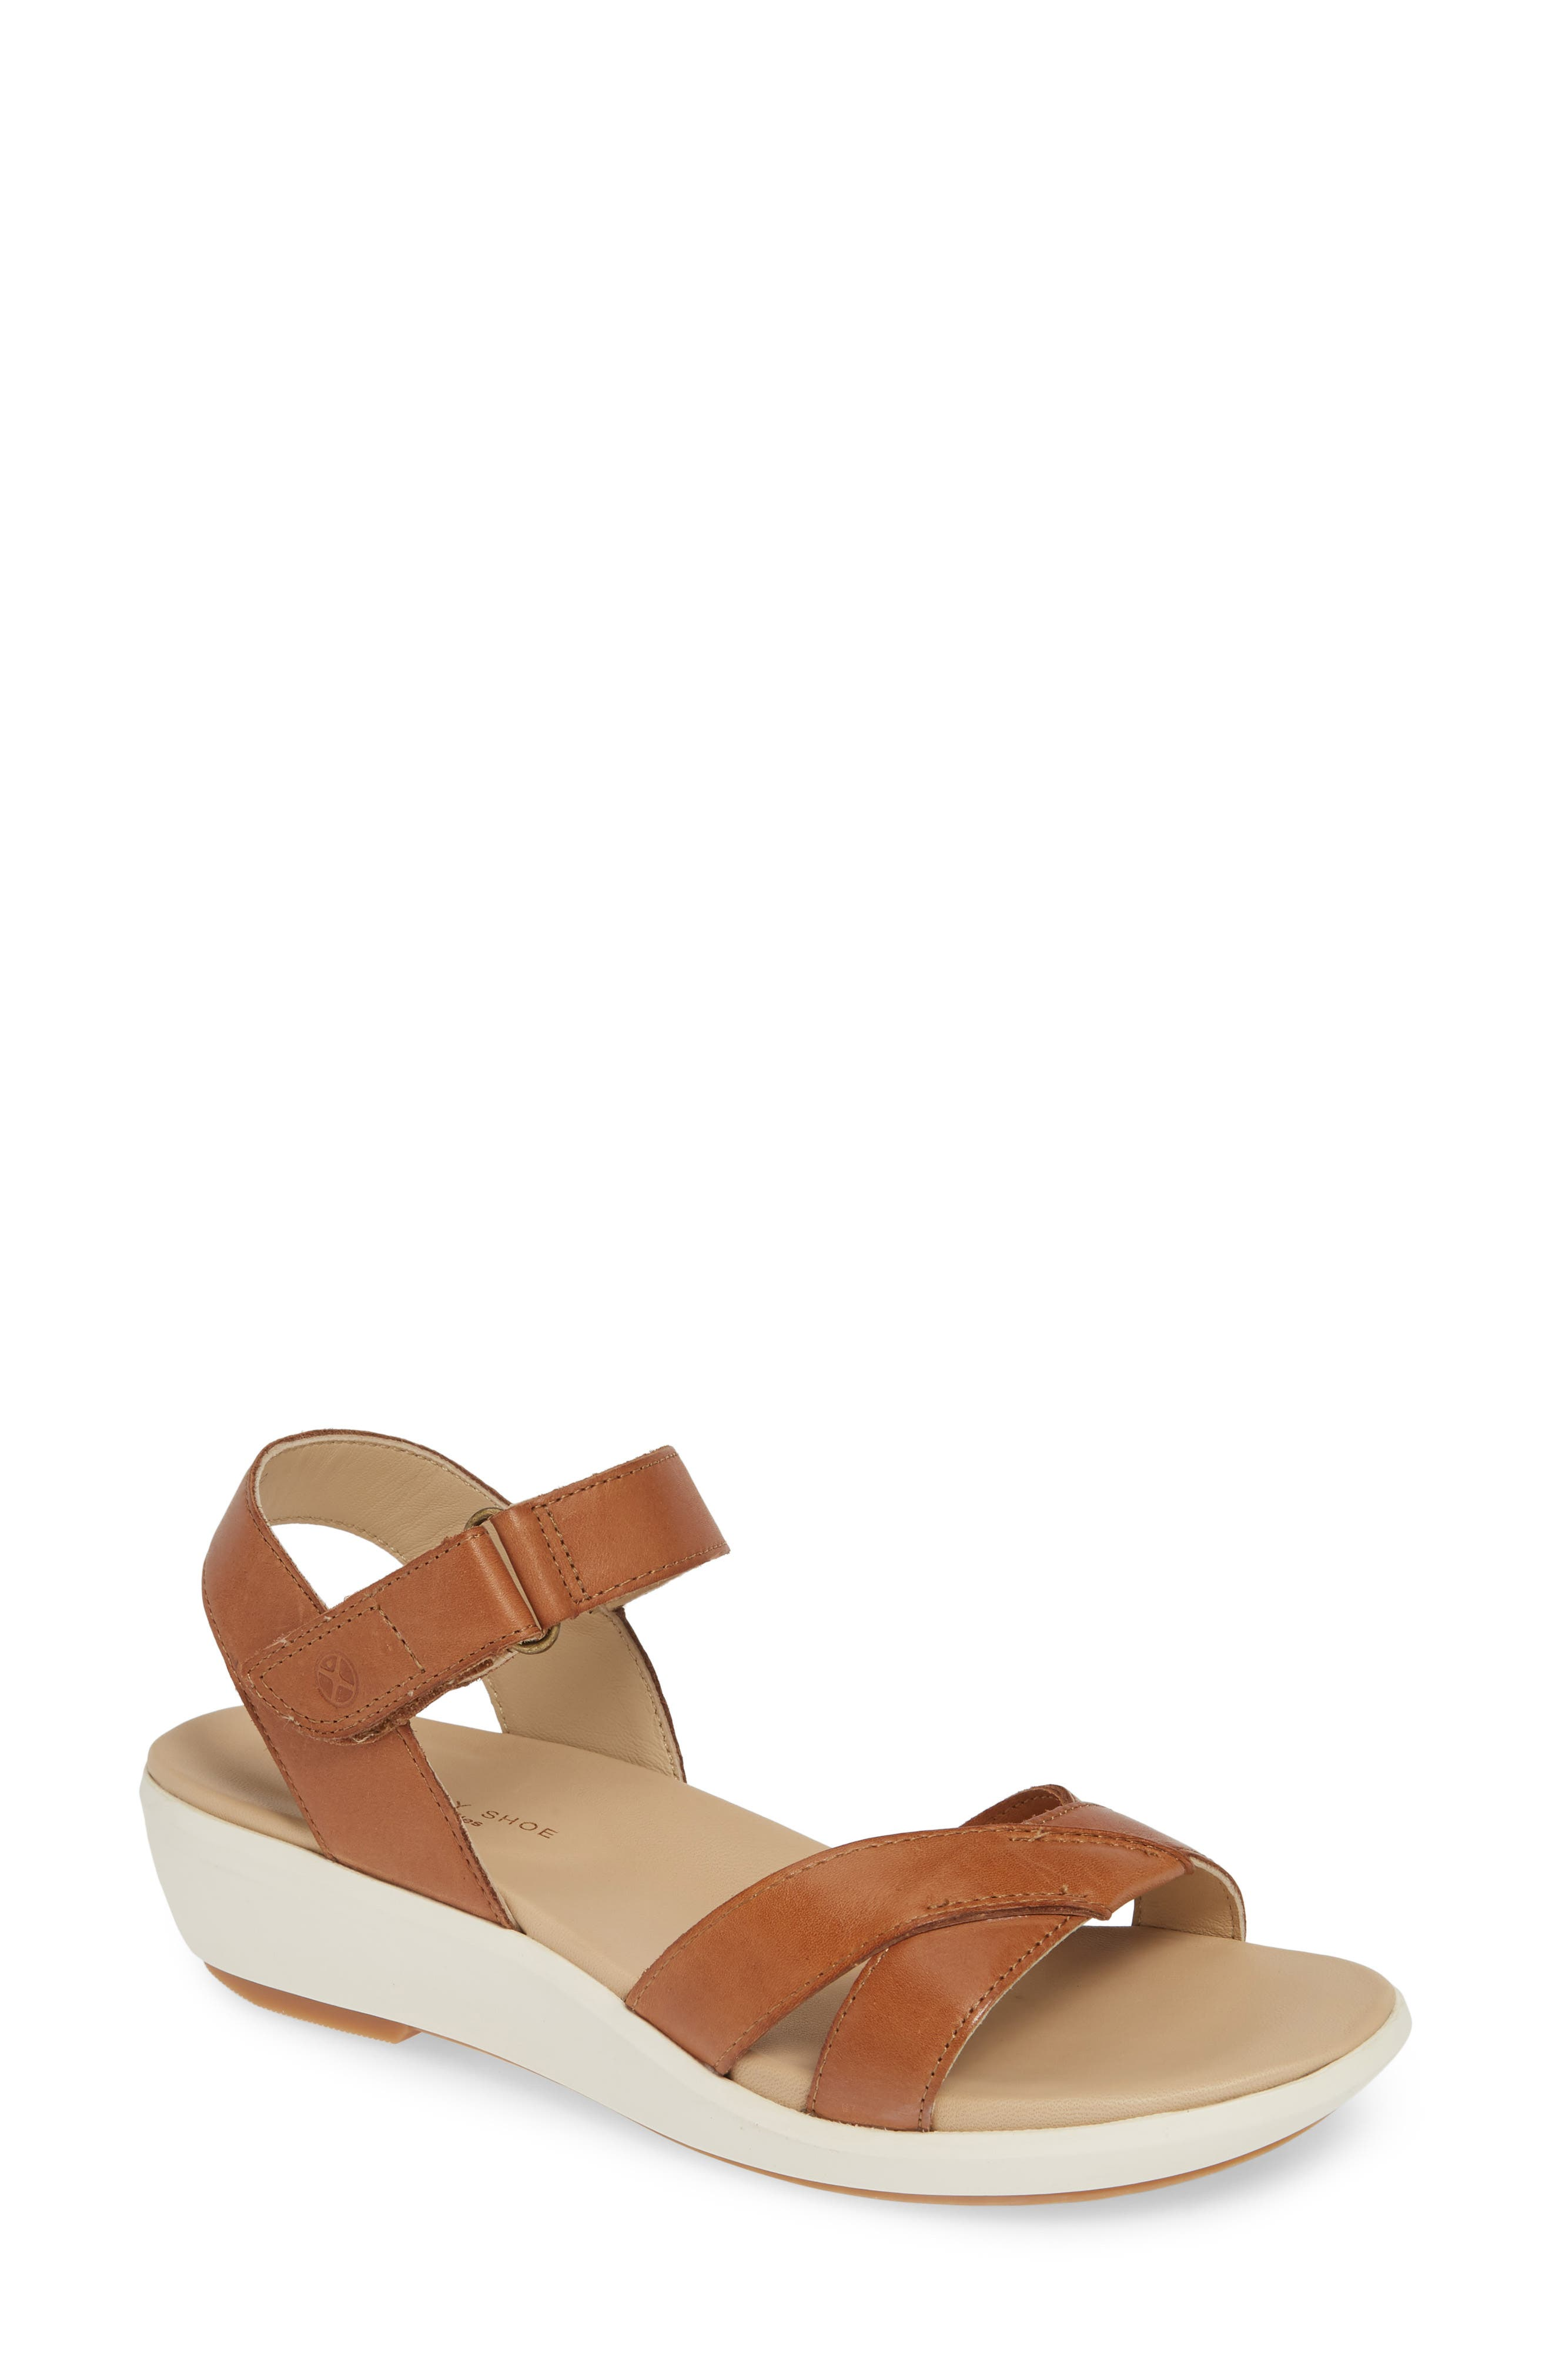 Lyricale Wedge Sandal, Main, color, TAN LEATHER